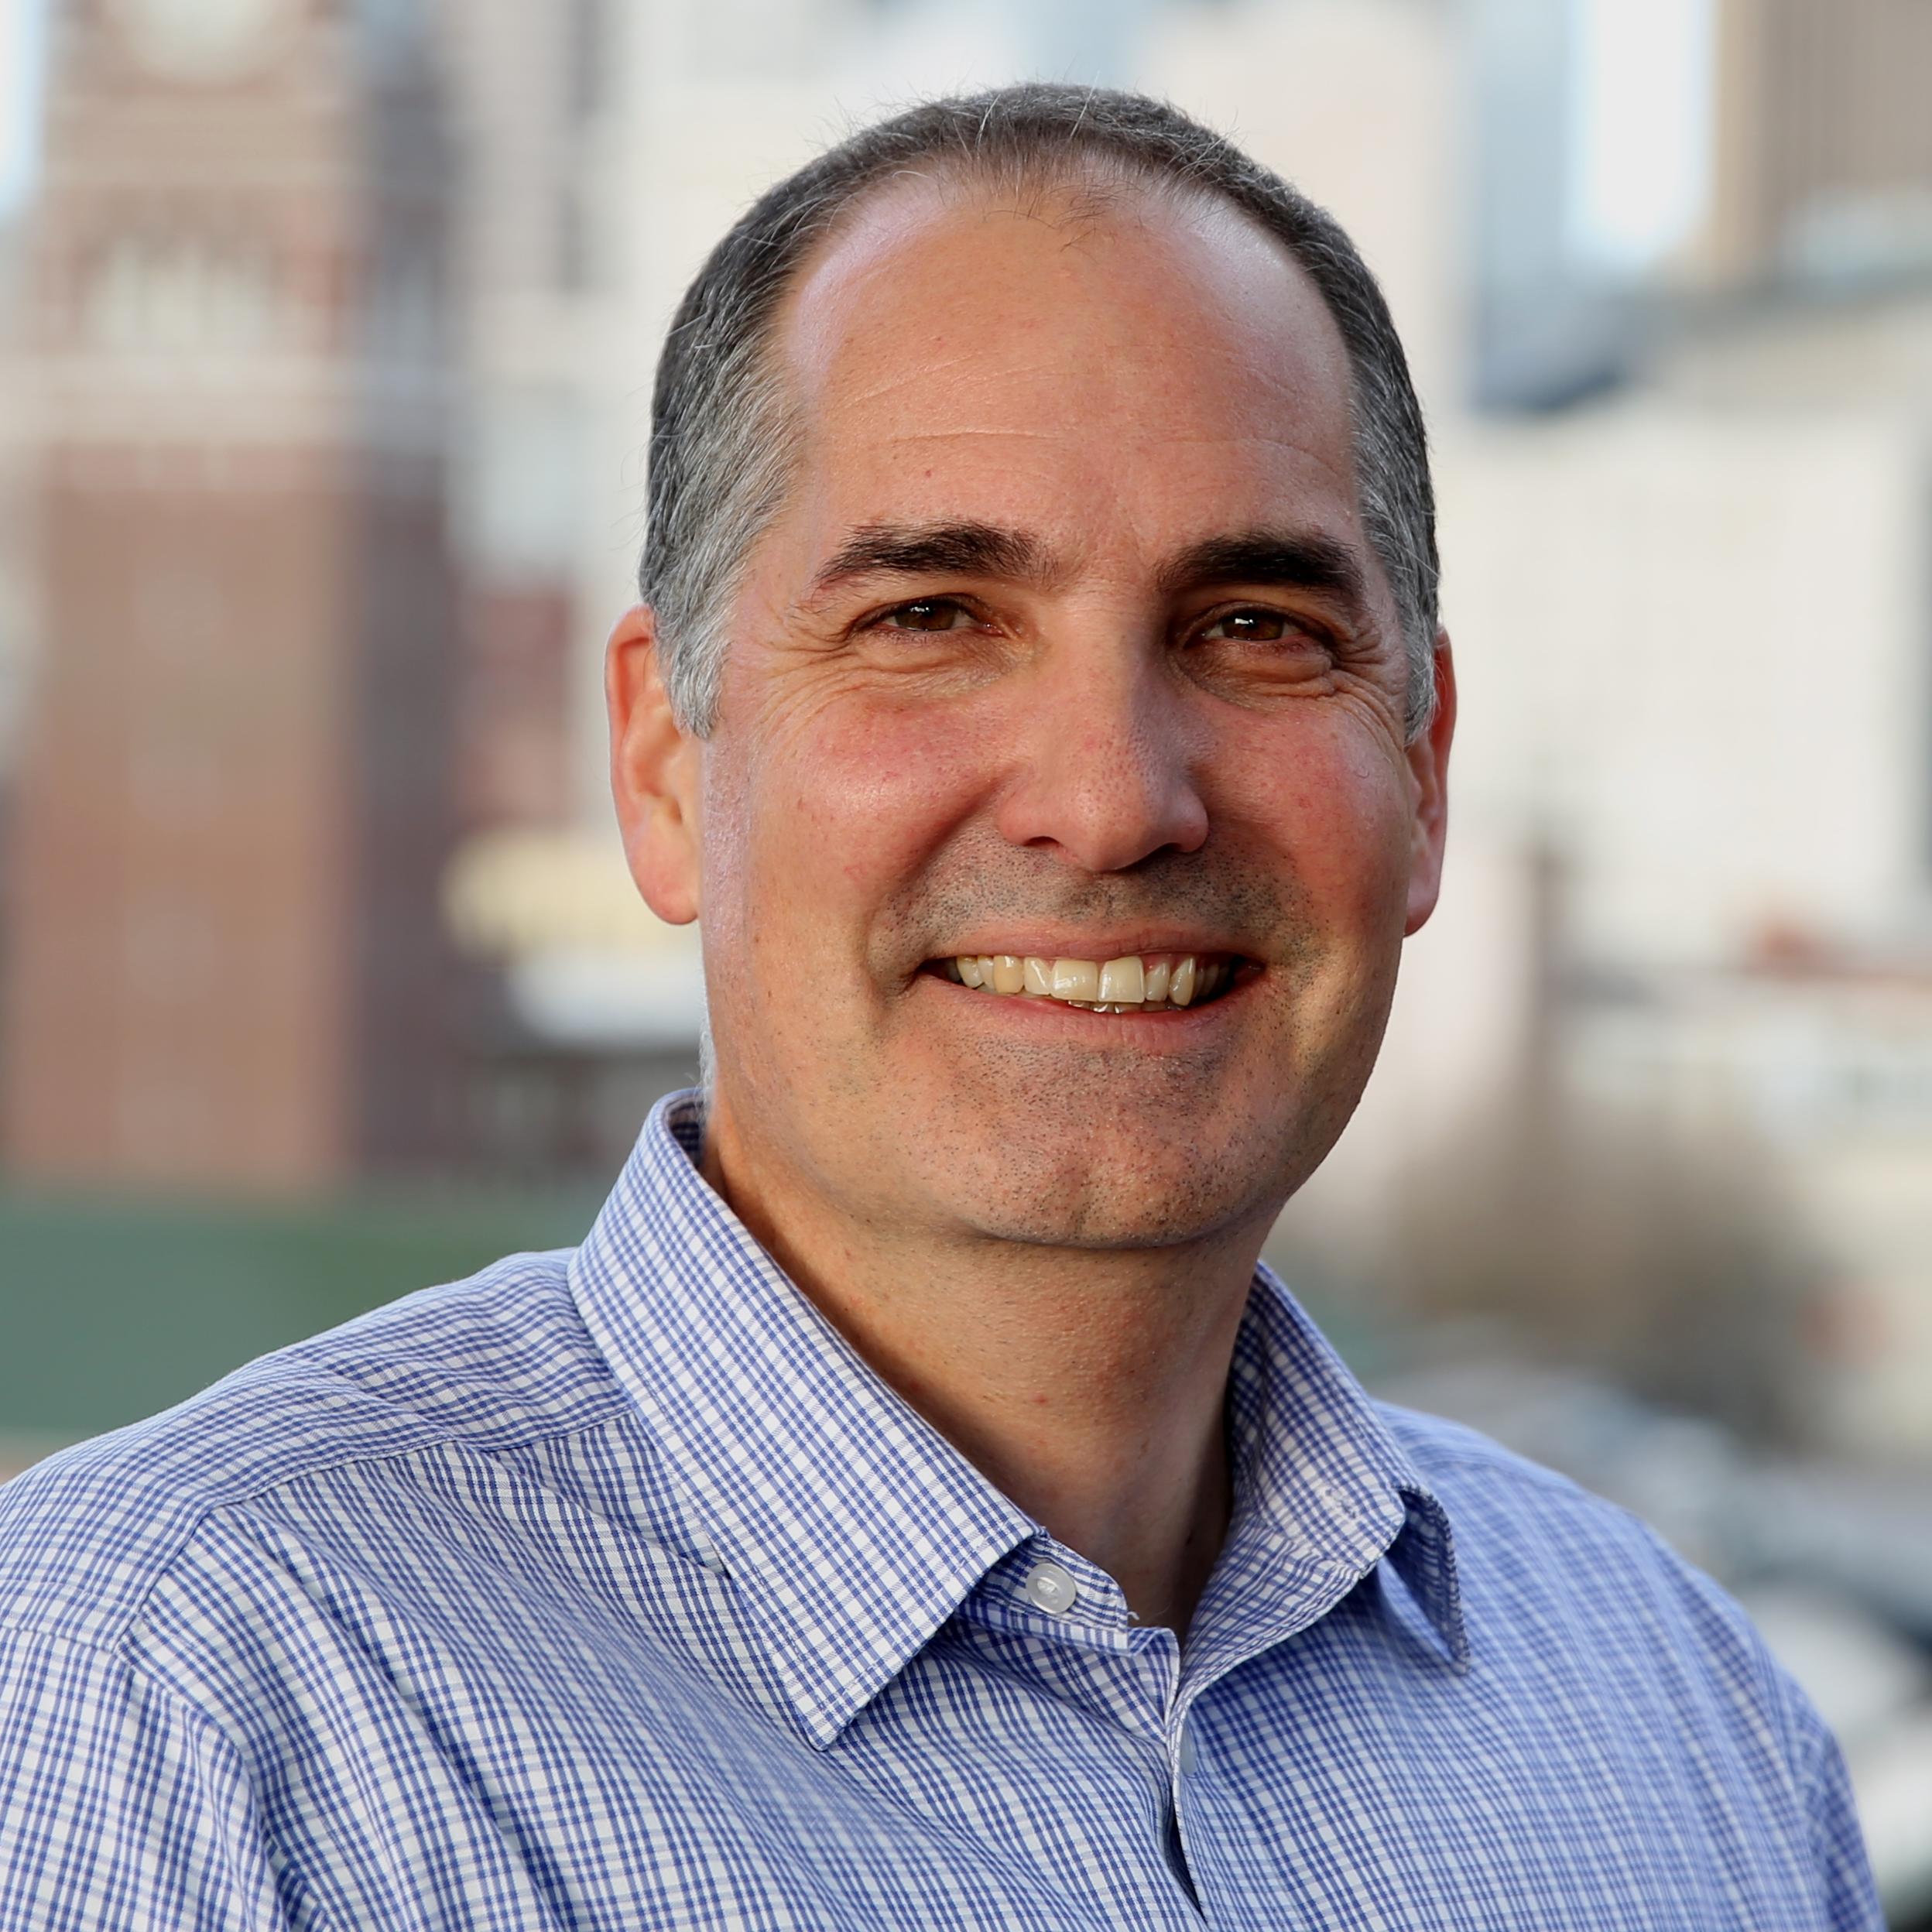 John Rynn, Vice President of Business Development at Globys